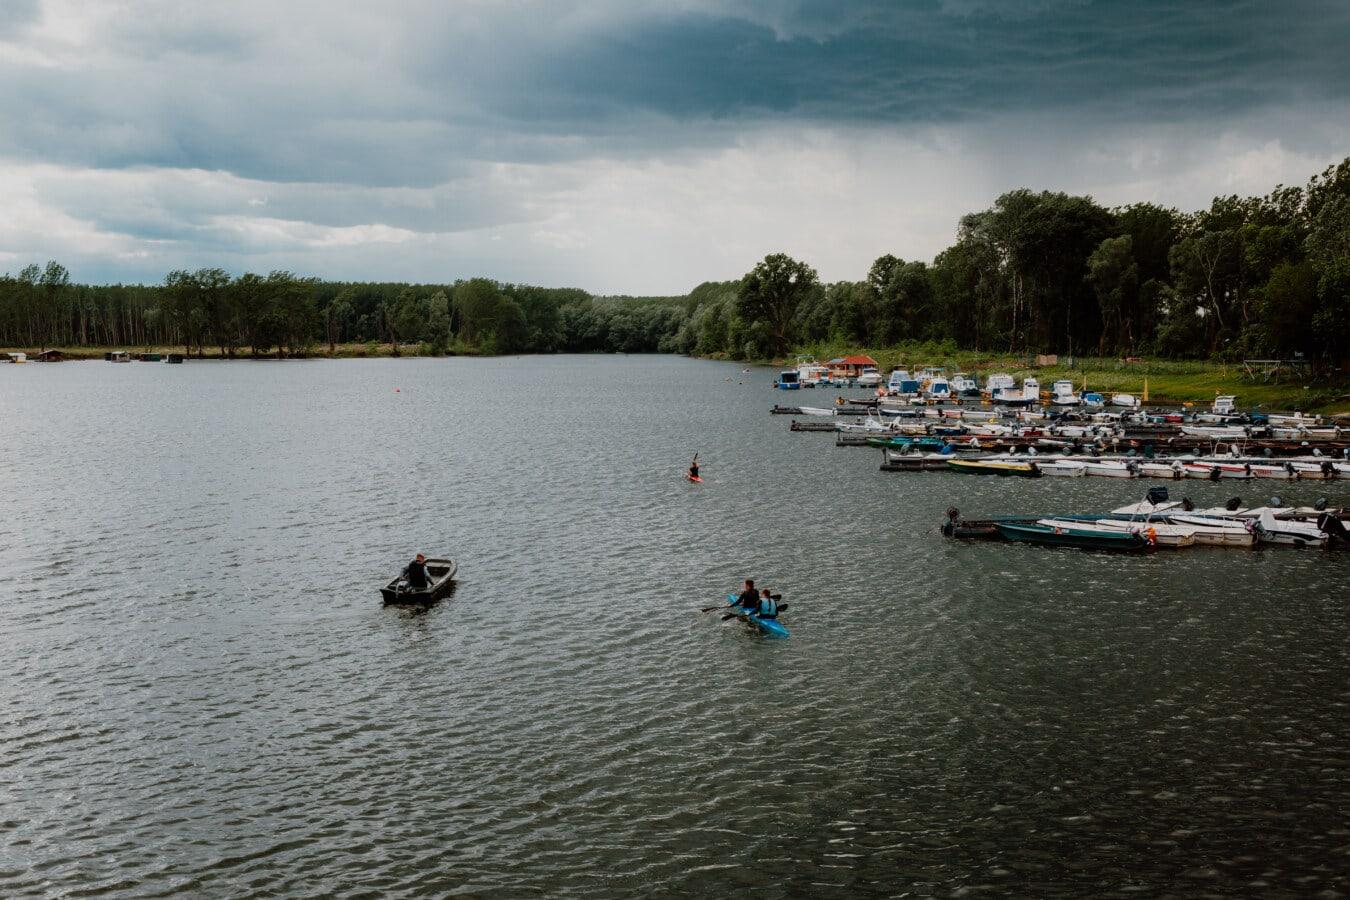 Becken, See, am See, Wasser, Fluss, Ufer, Wasserfahrzeuge, Kanu, Boot, Paddel